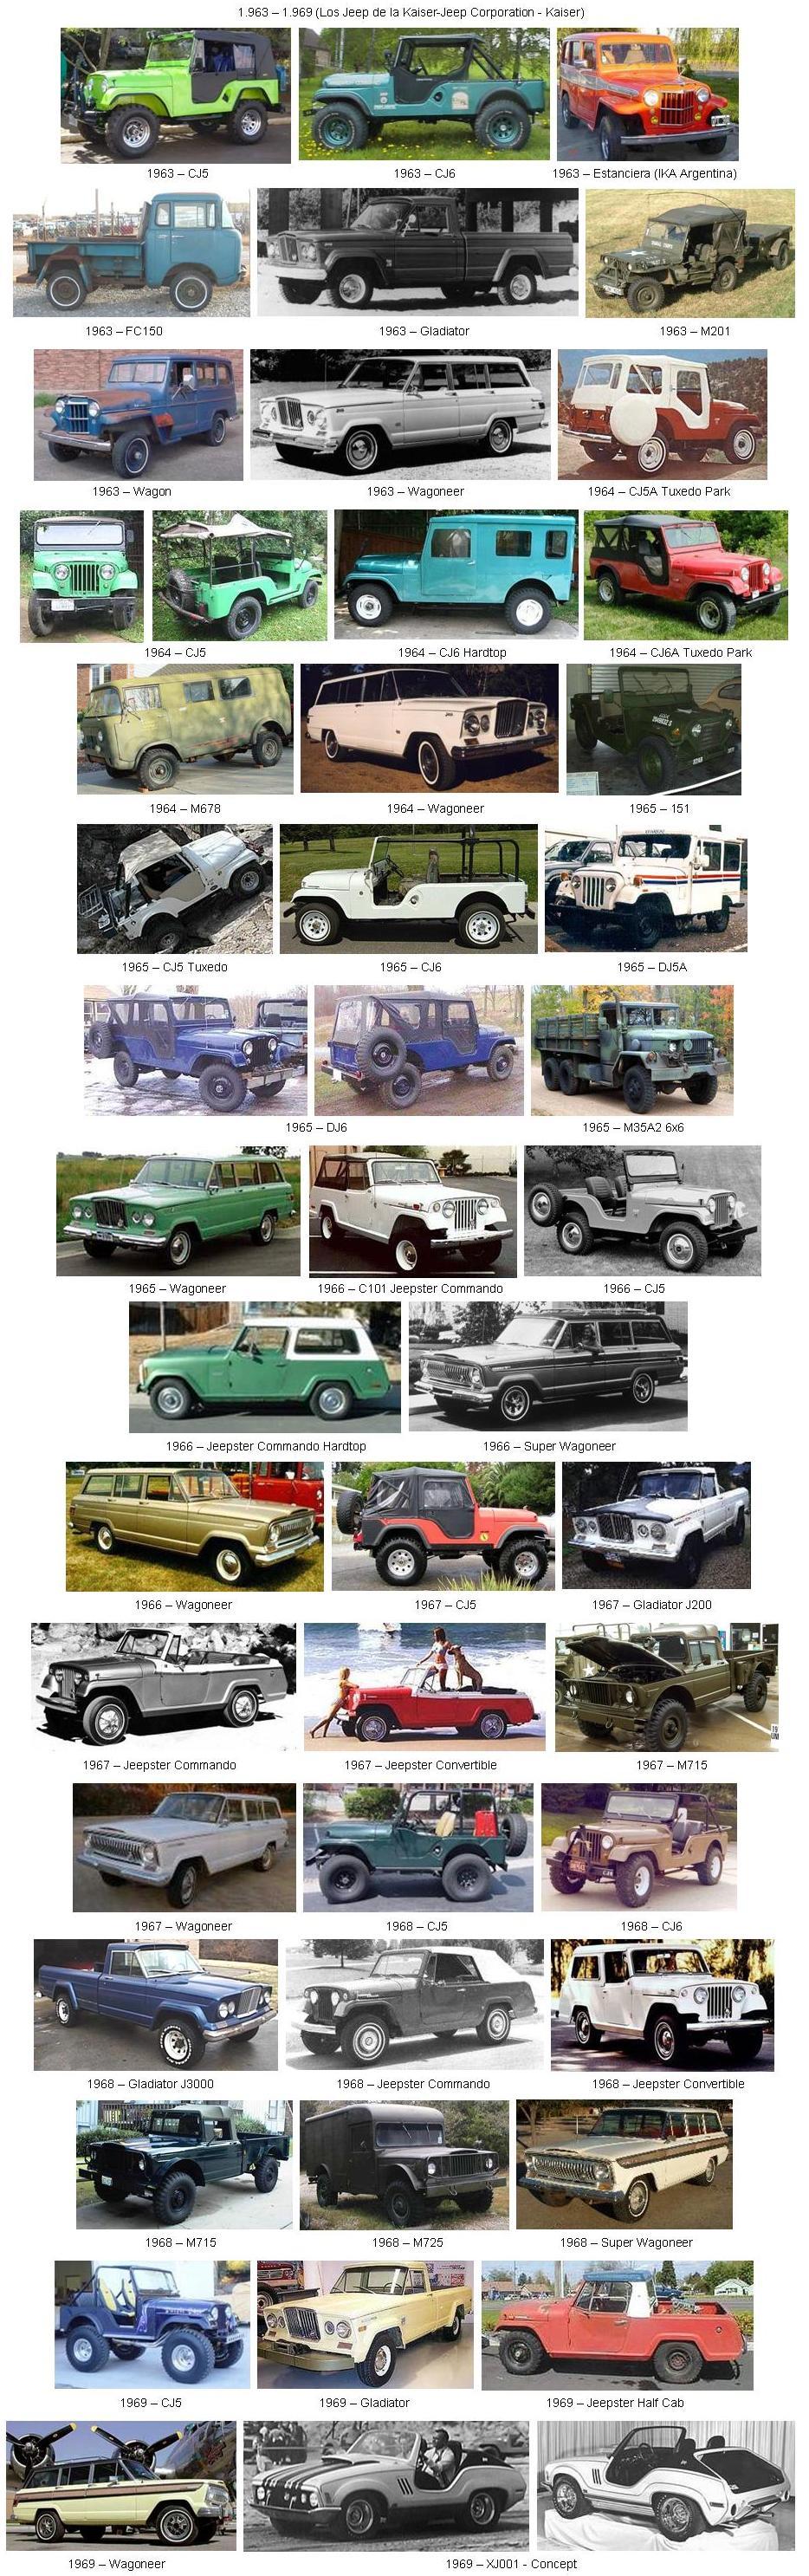 Historia Gráfica de la Jeep JEEP-04-(1963-1969)-(Kaiser-Jeep%20Corporation%20-%20Kaiser)